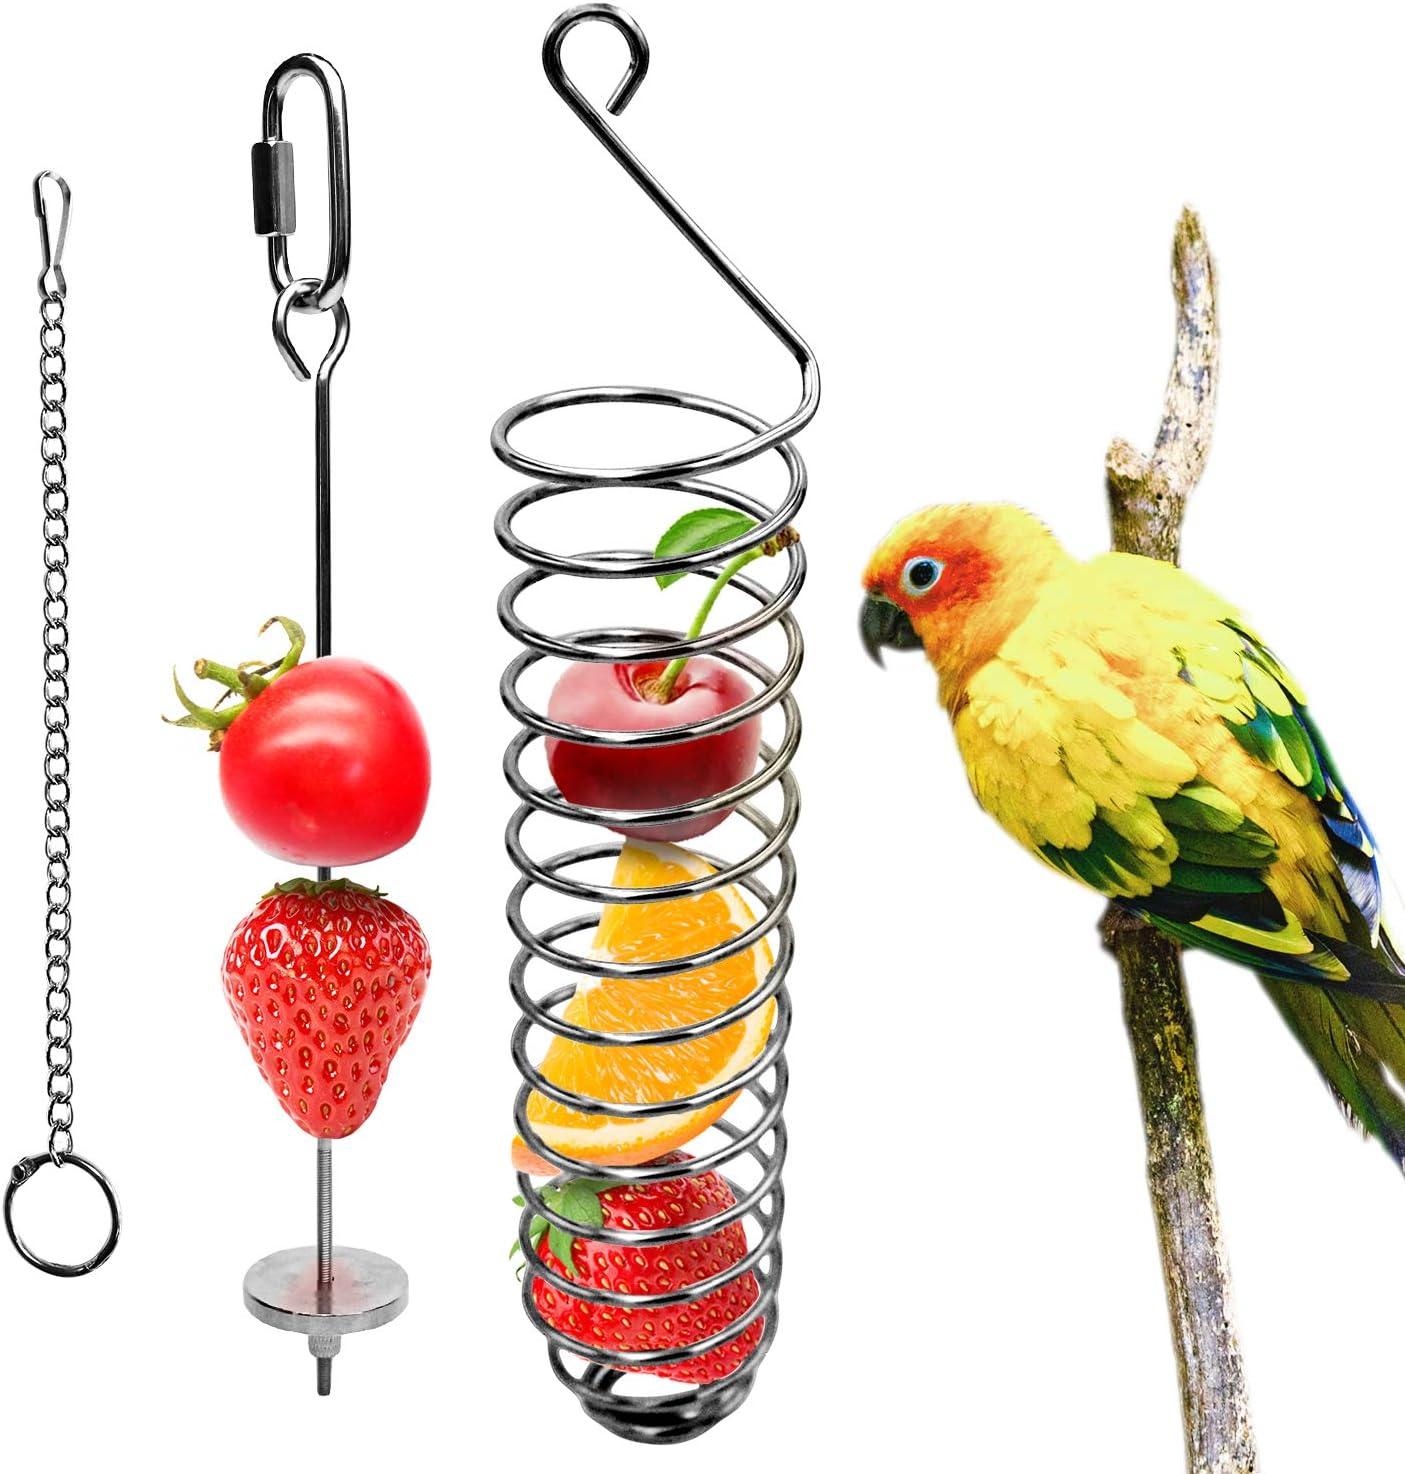 Bird Food Holder, Bird Feeder Toy, Bird Small Animal Fruit Vegetable Holder Stainless Steel Vegetable Skewer Foraging Hanging Food Feed Treating Tool for Parrots Cockatoo Cockatiel